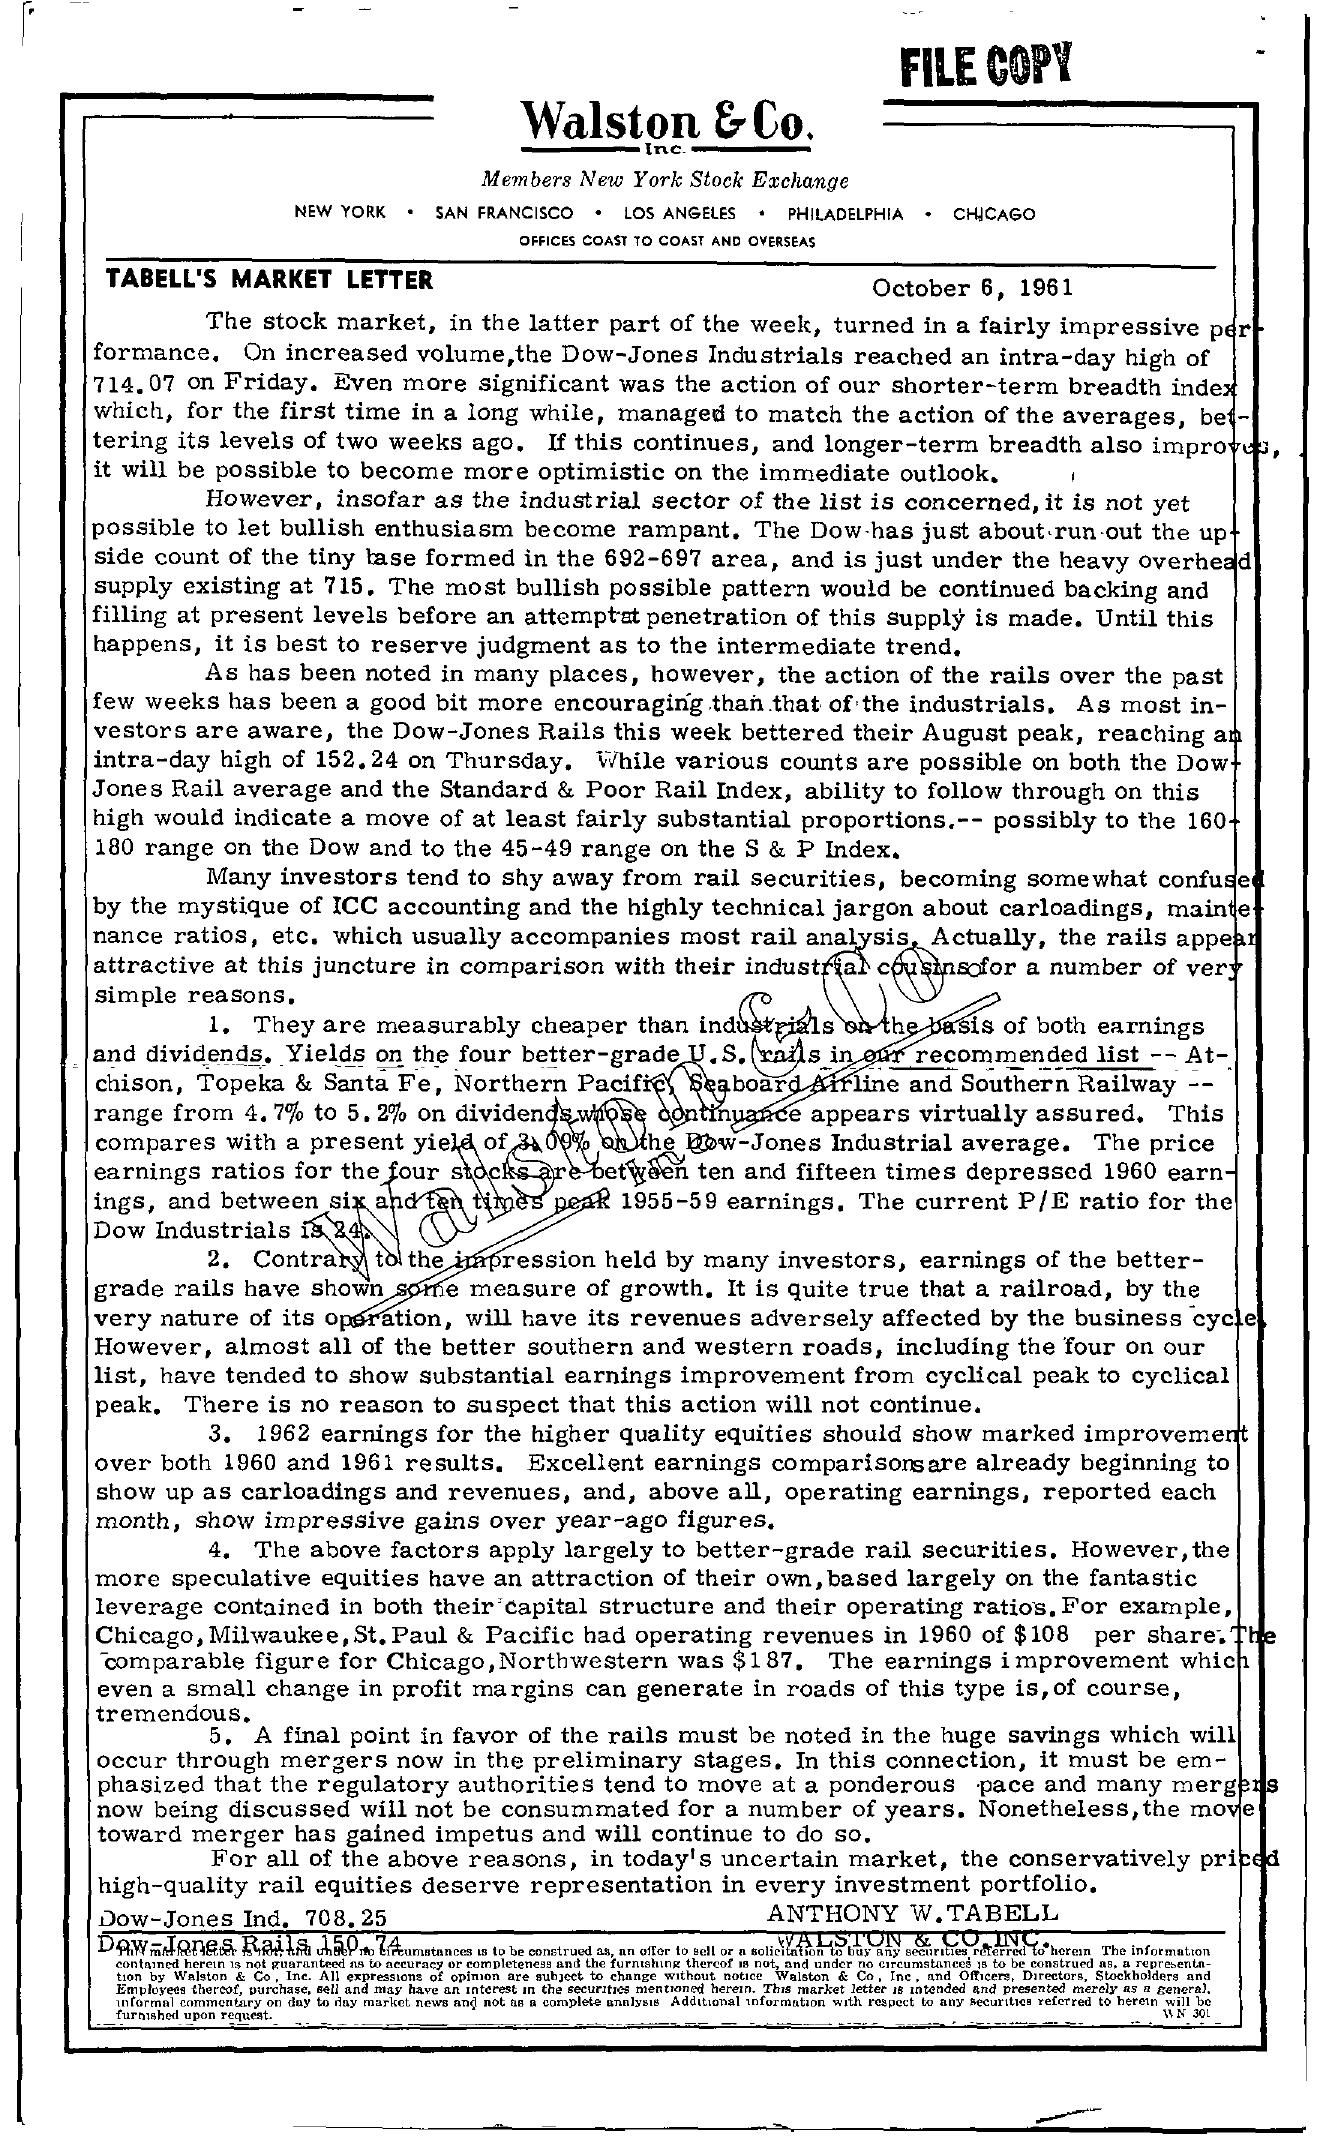 Tabell's Market Letter - October 06, 1961